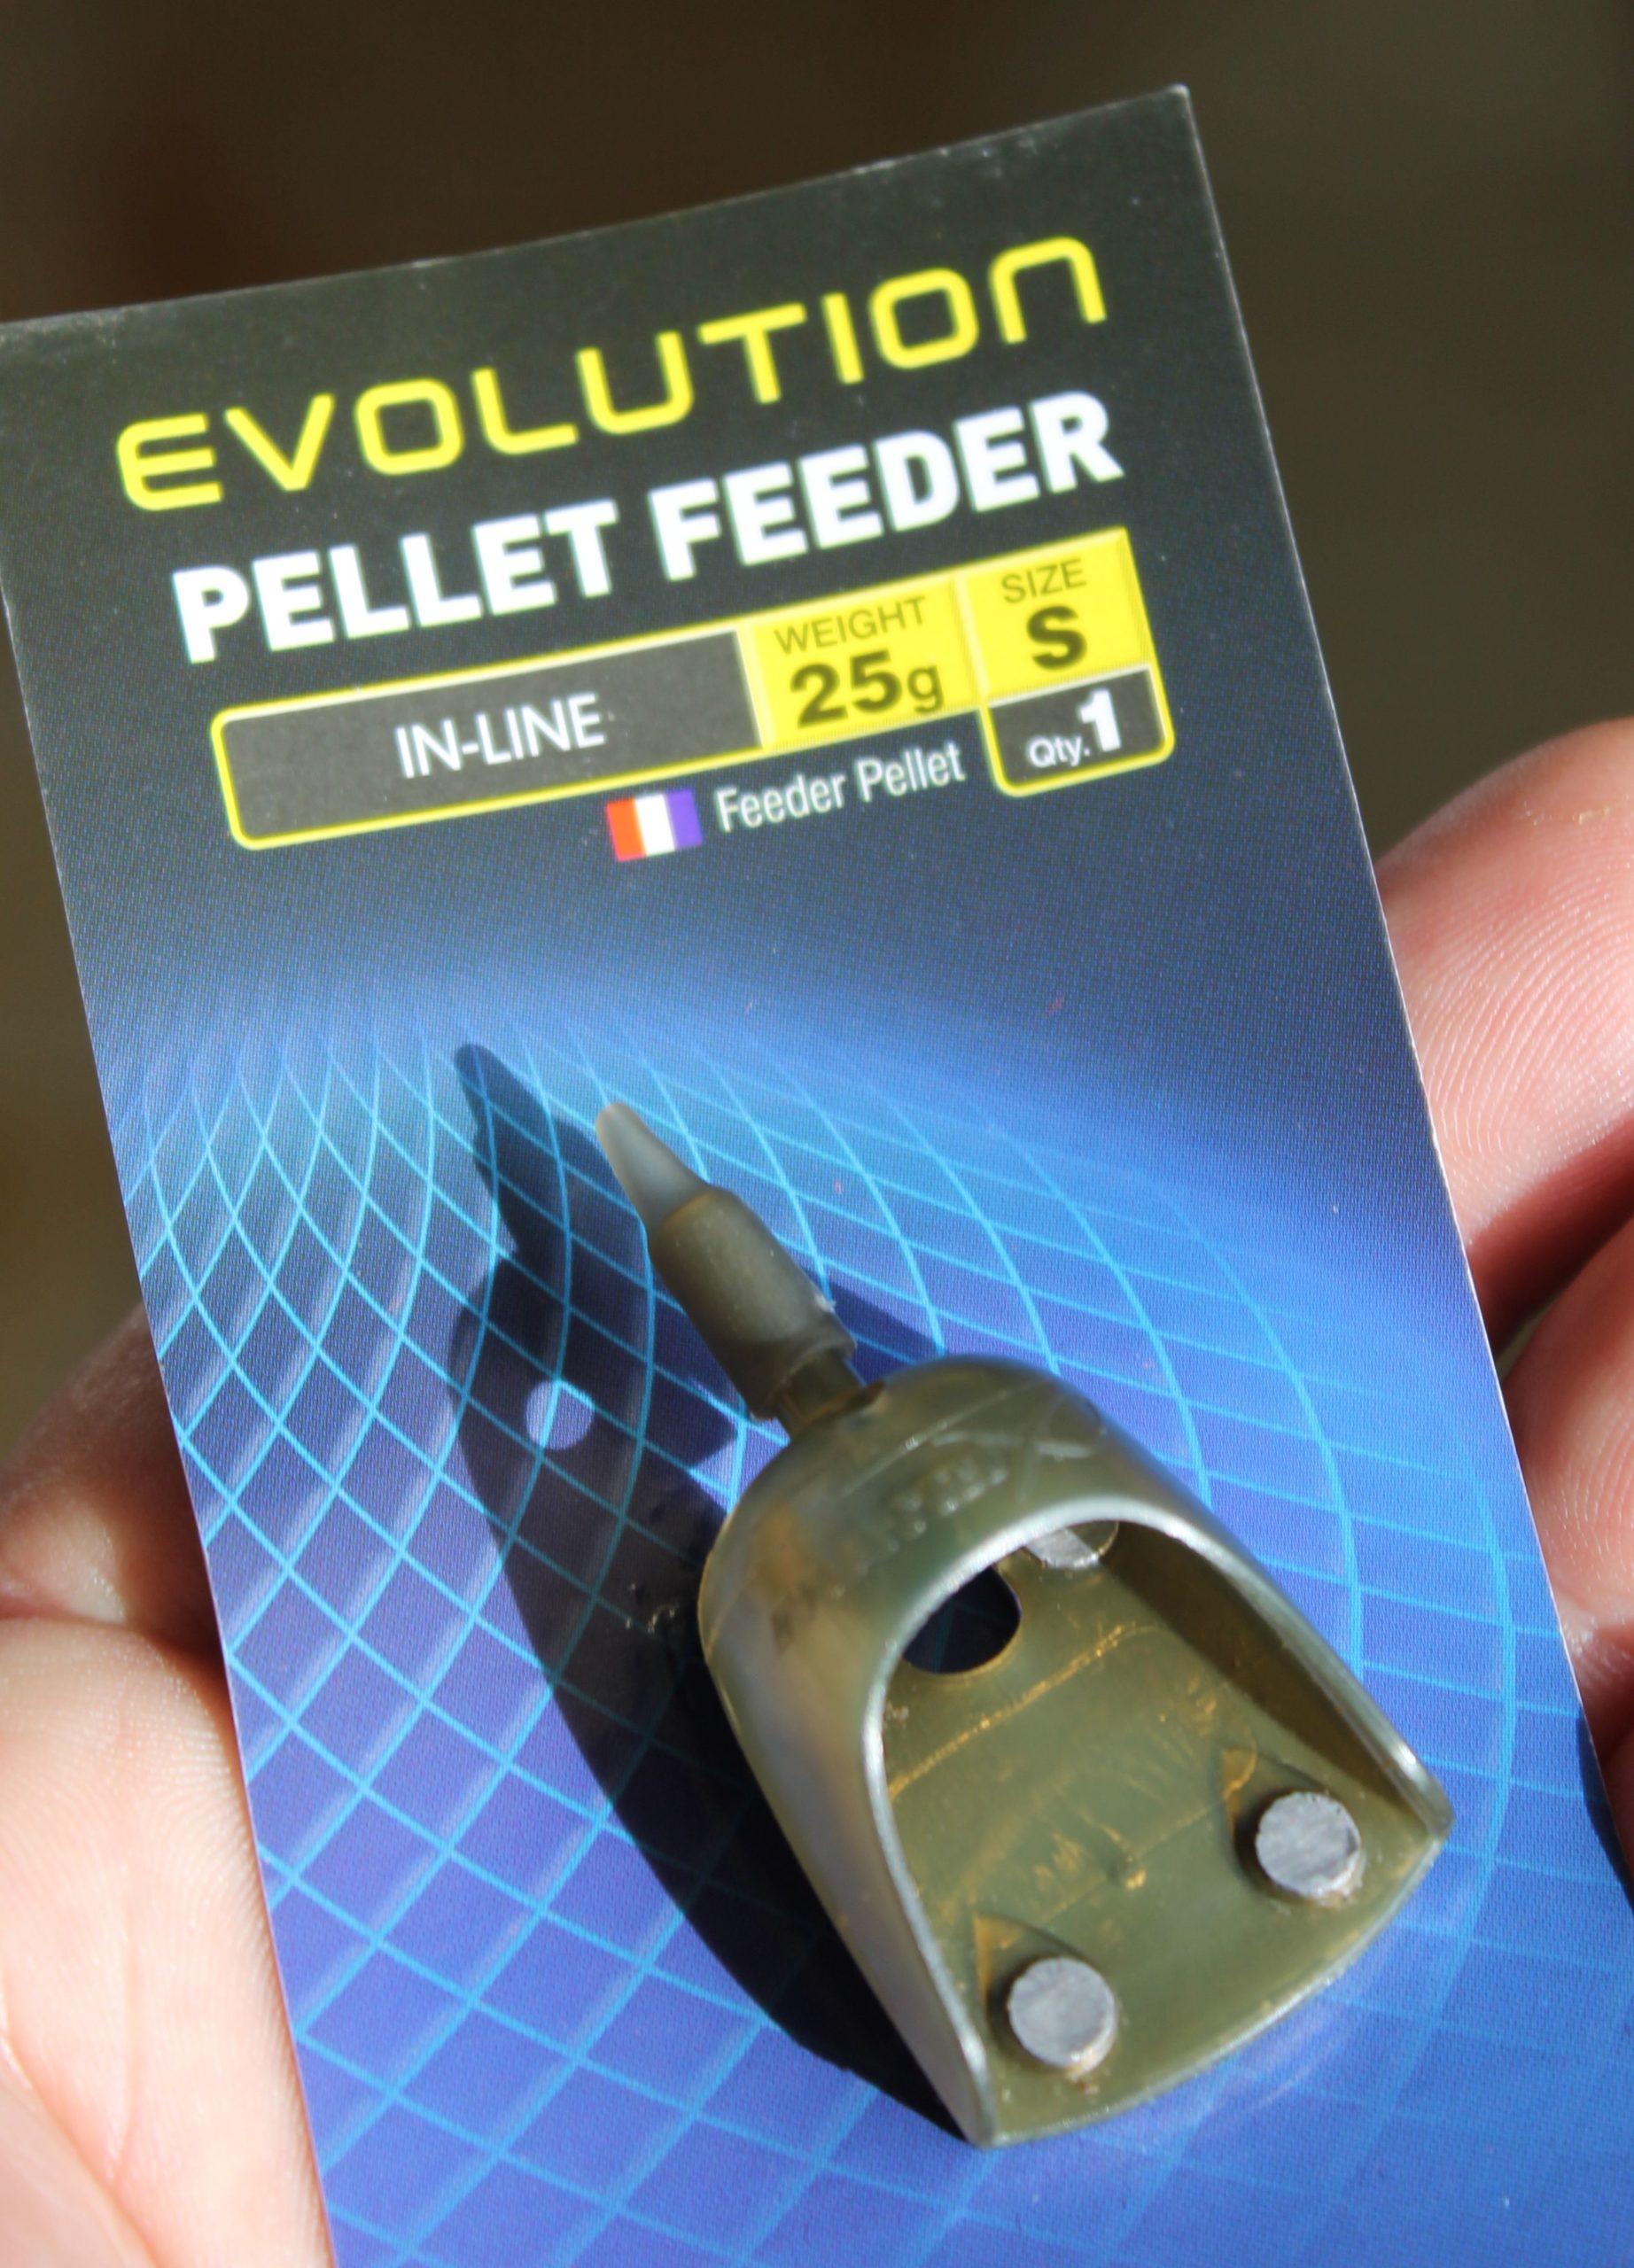 Evolution Pellet Feeder